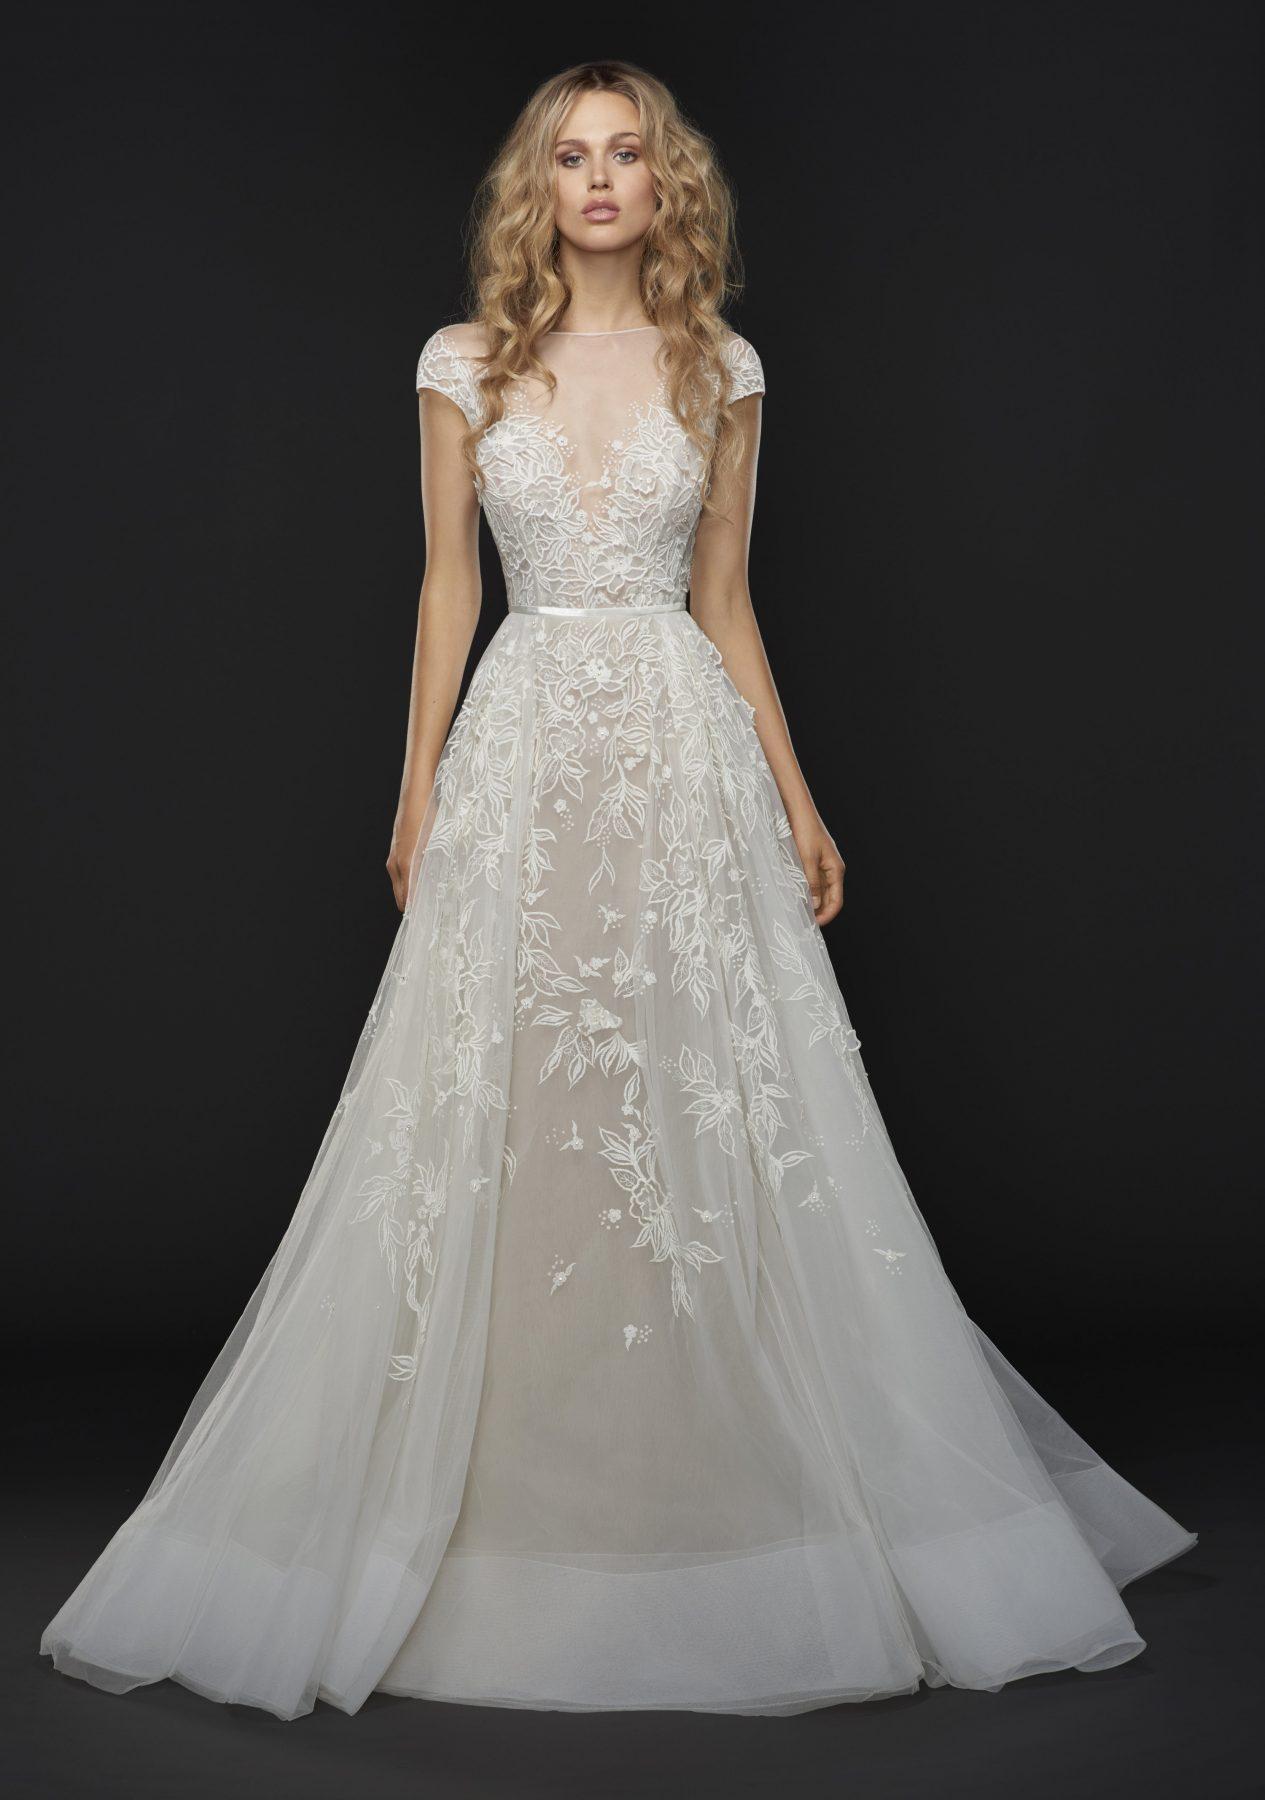 Romantic Ball Gown Wedding Dress | Kleinfeld Bridal